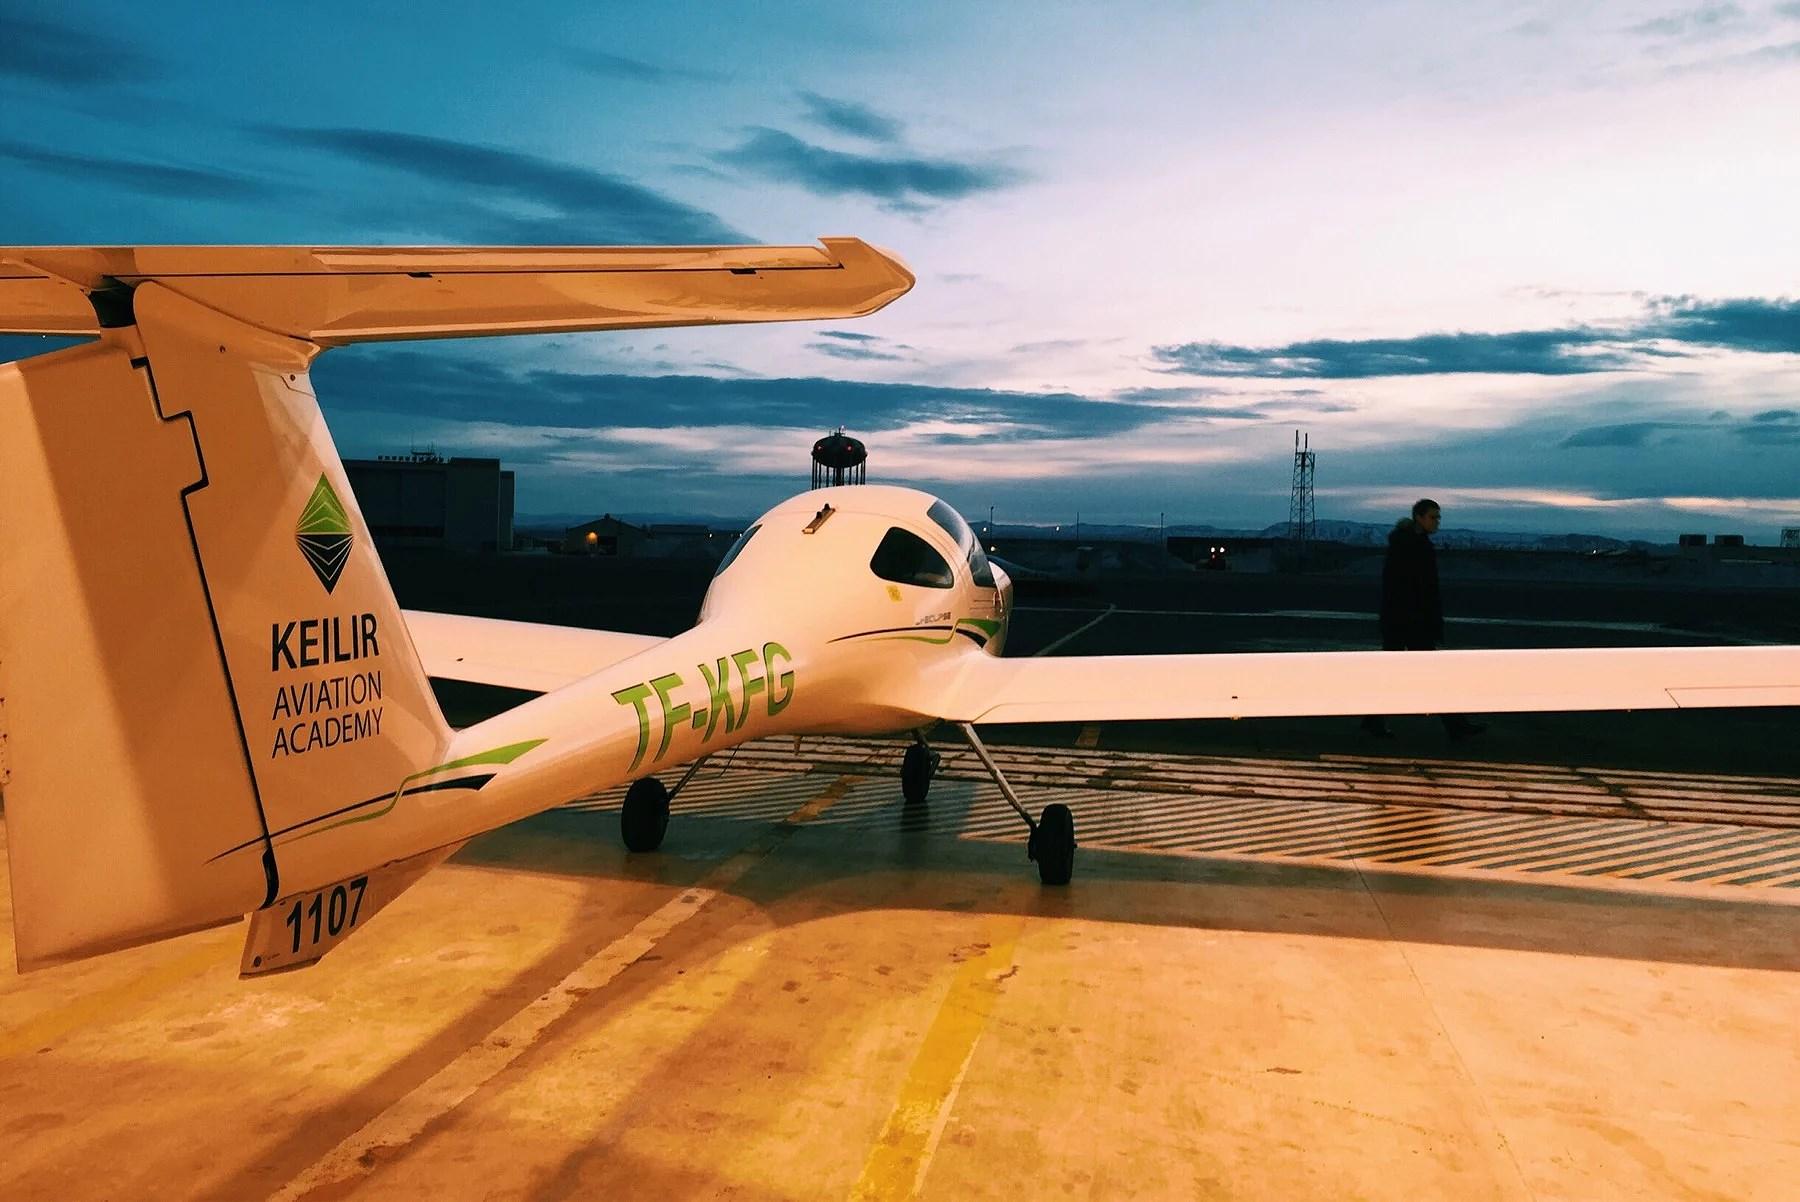 FIRST FLIGHT AND FIRST LANDING!